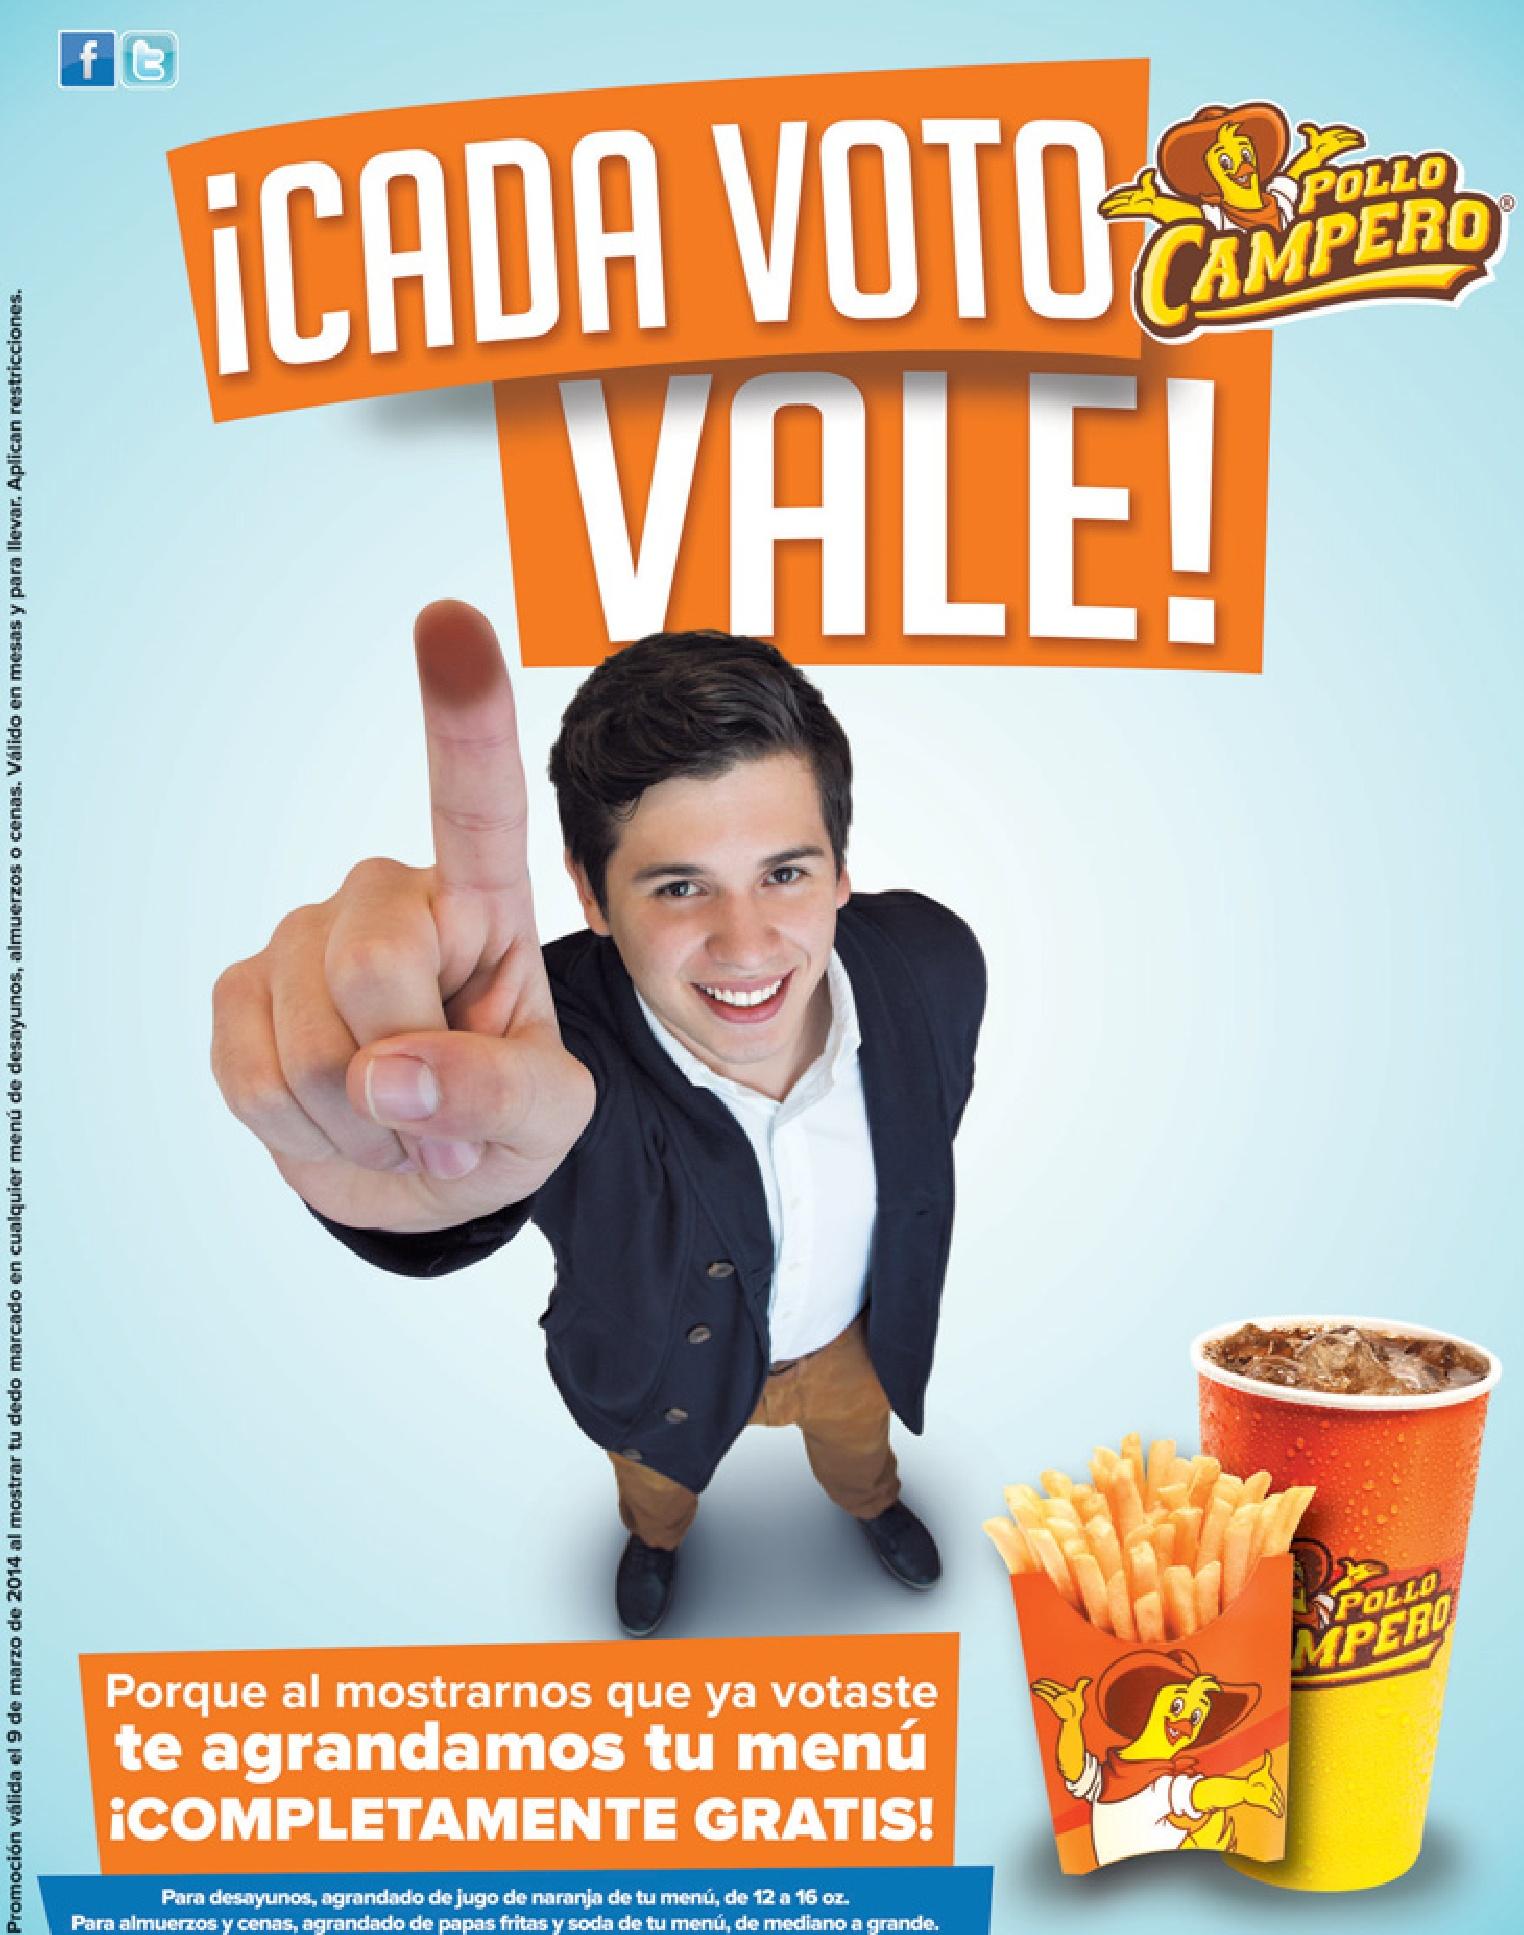 cada voto vale PROMOCION pollo campero - 09mar14